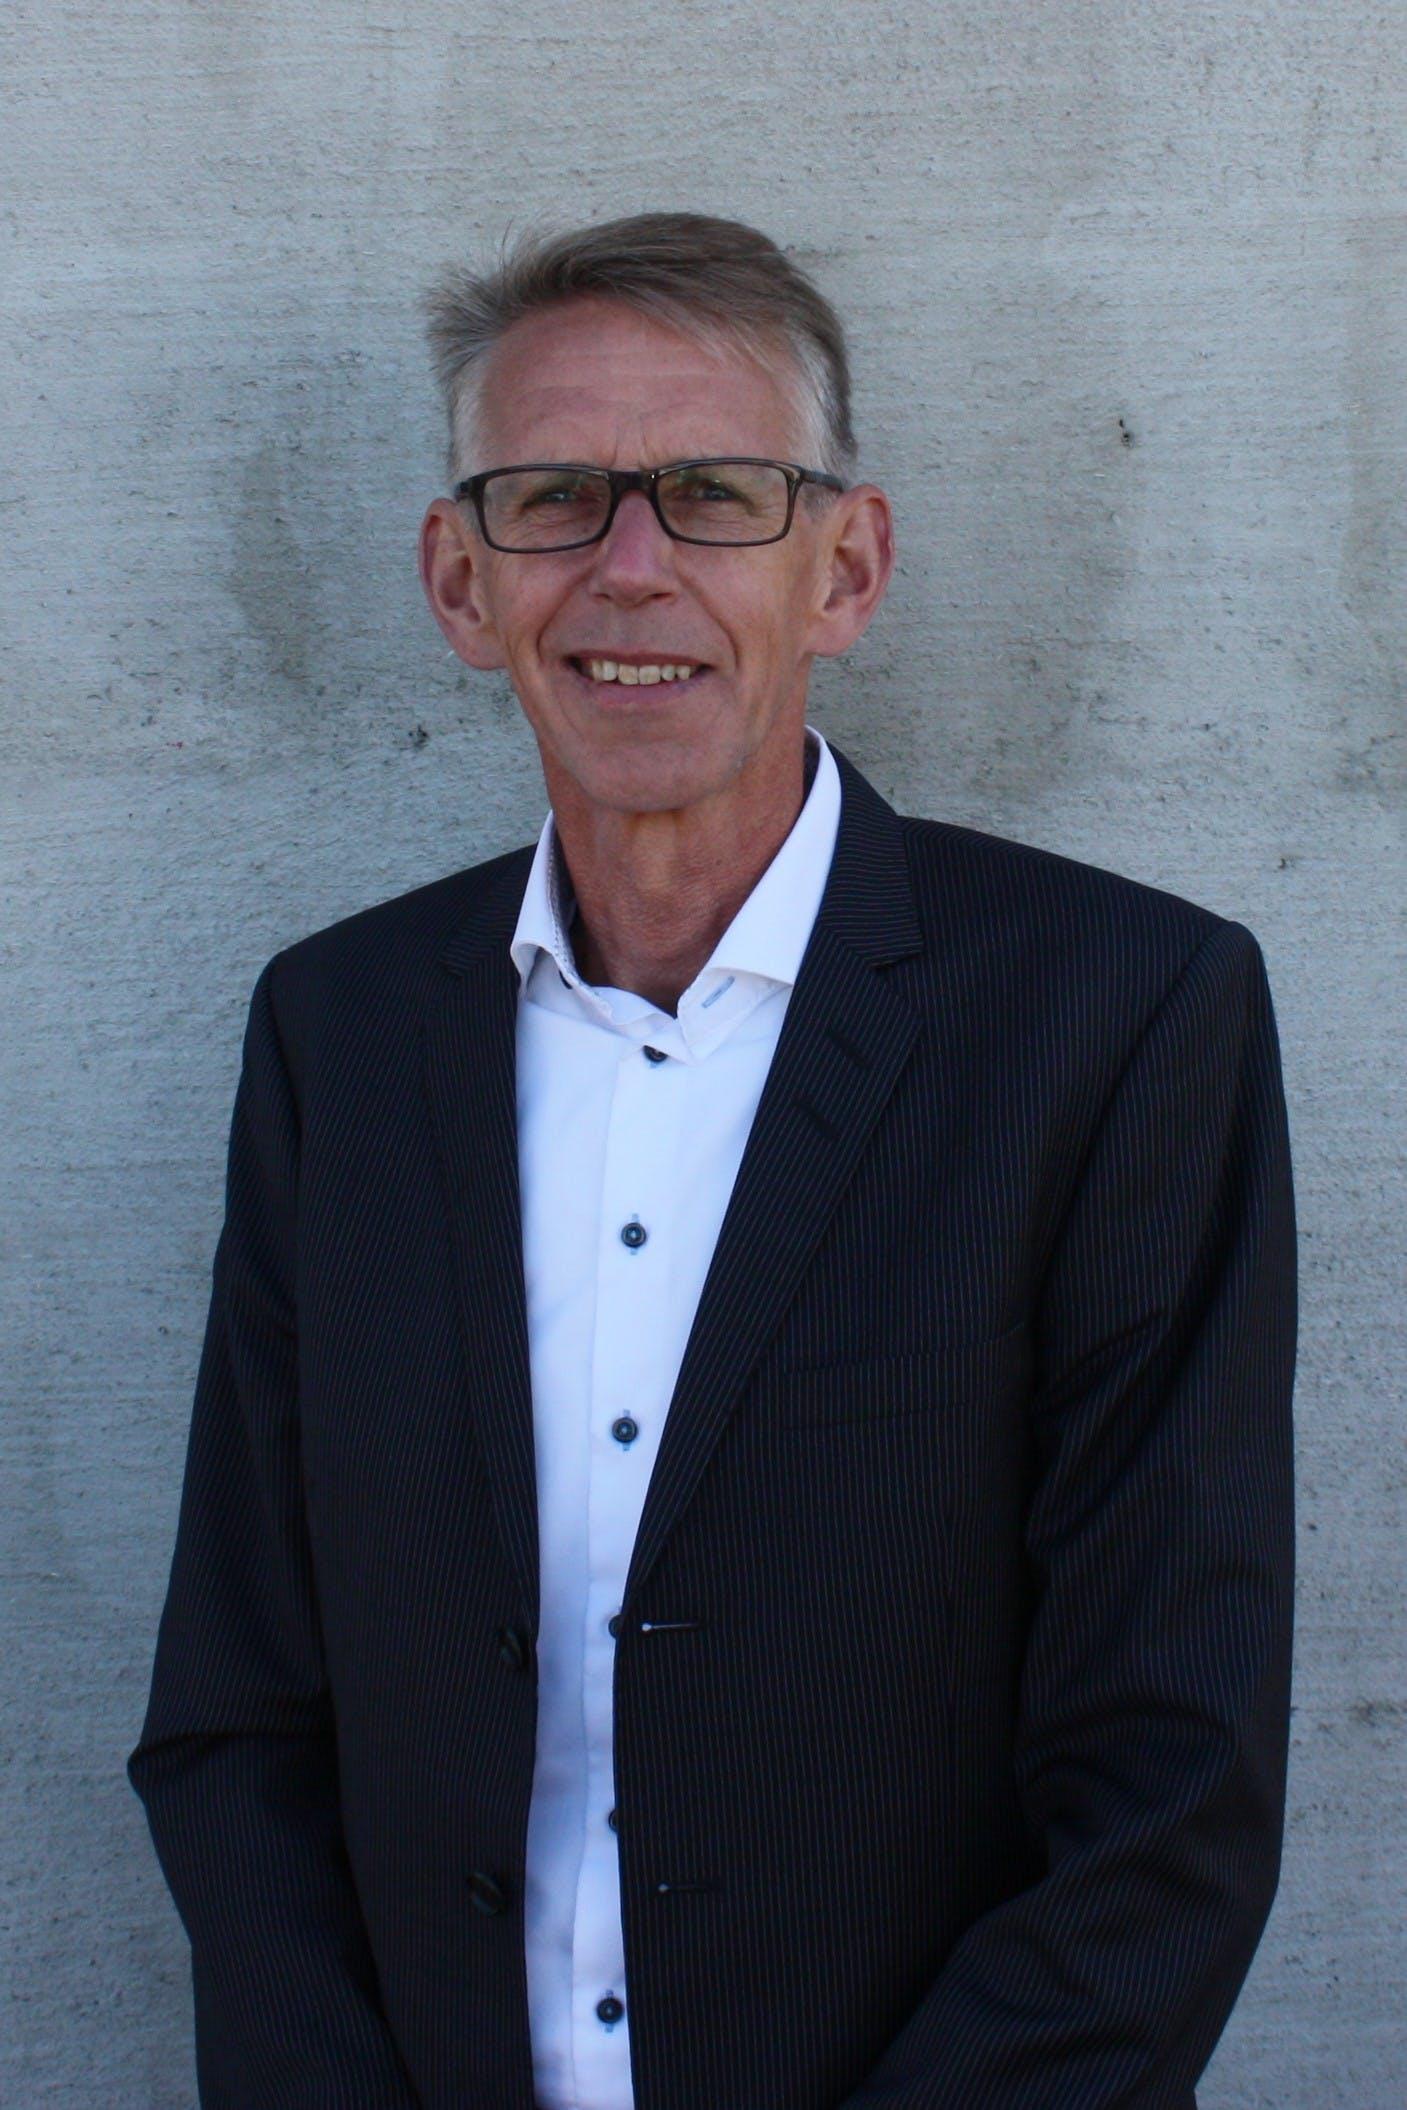 Arild Dregelid